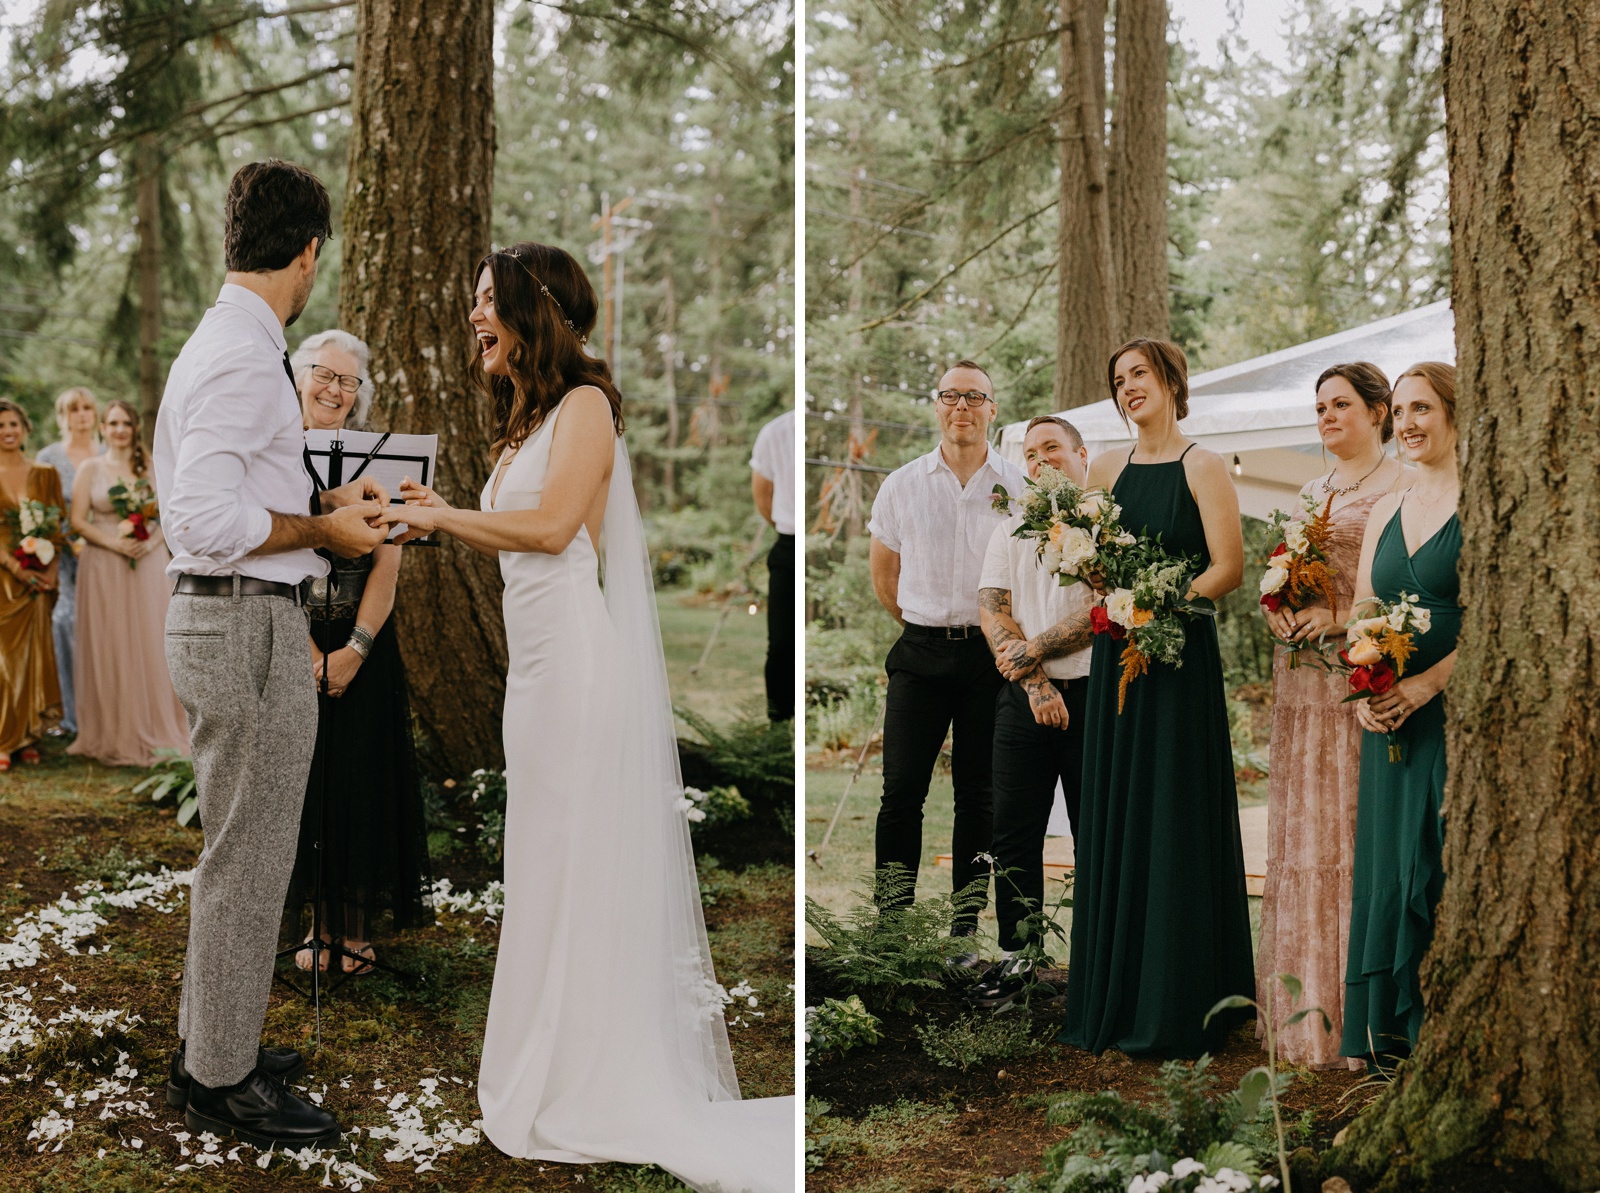 Matthew and Autumn Intimate Outdoor Backyard Wedding_0152